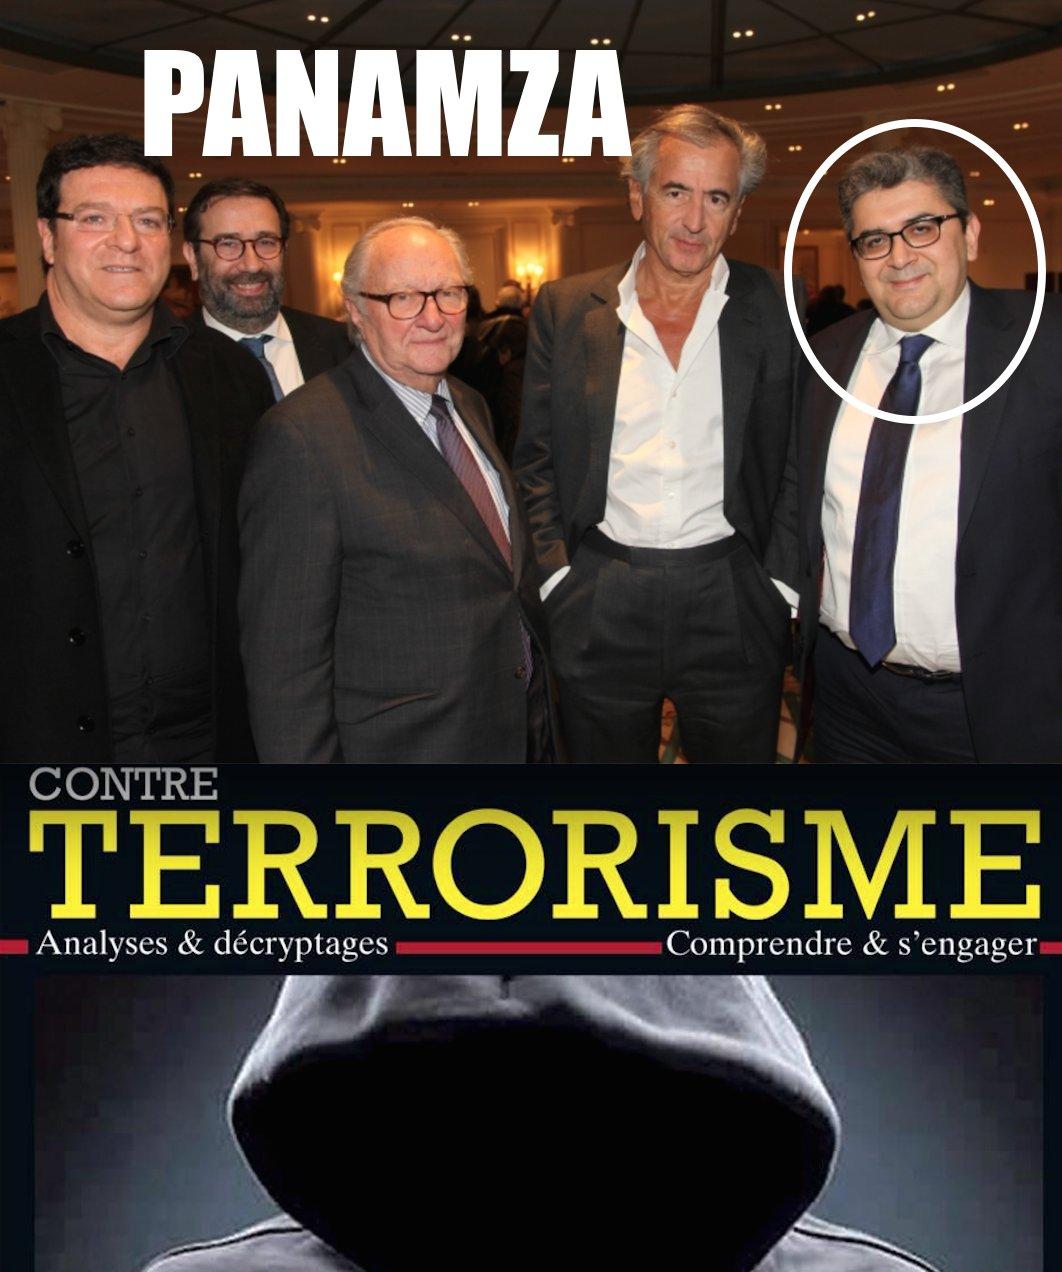 Sponsorisé par Israël, l'islamophobe Sifaoui lance son magazine